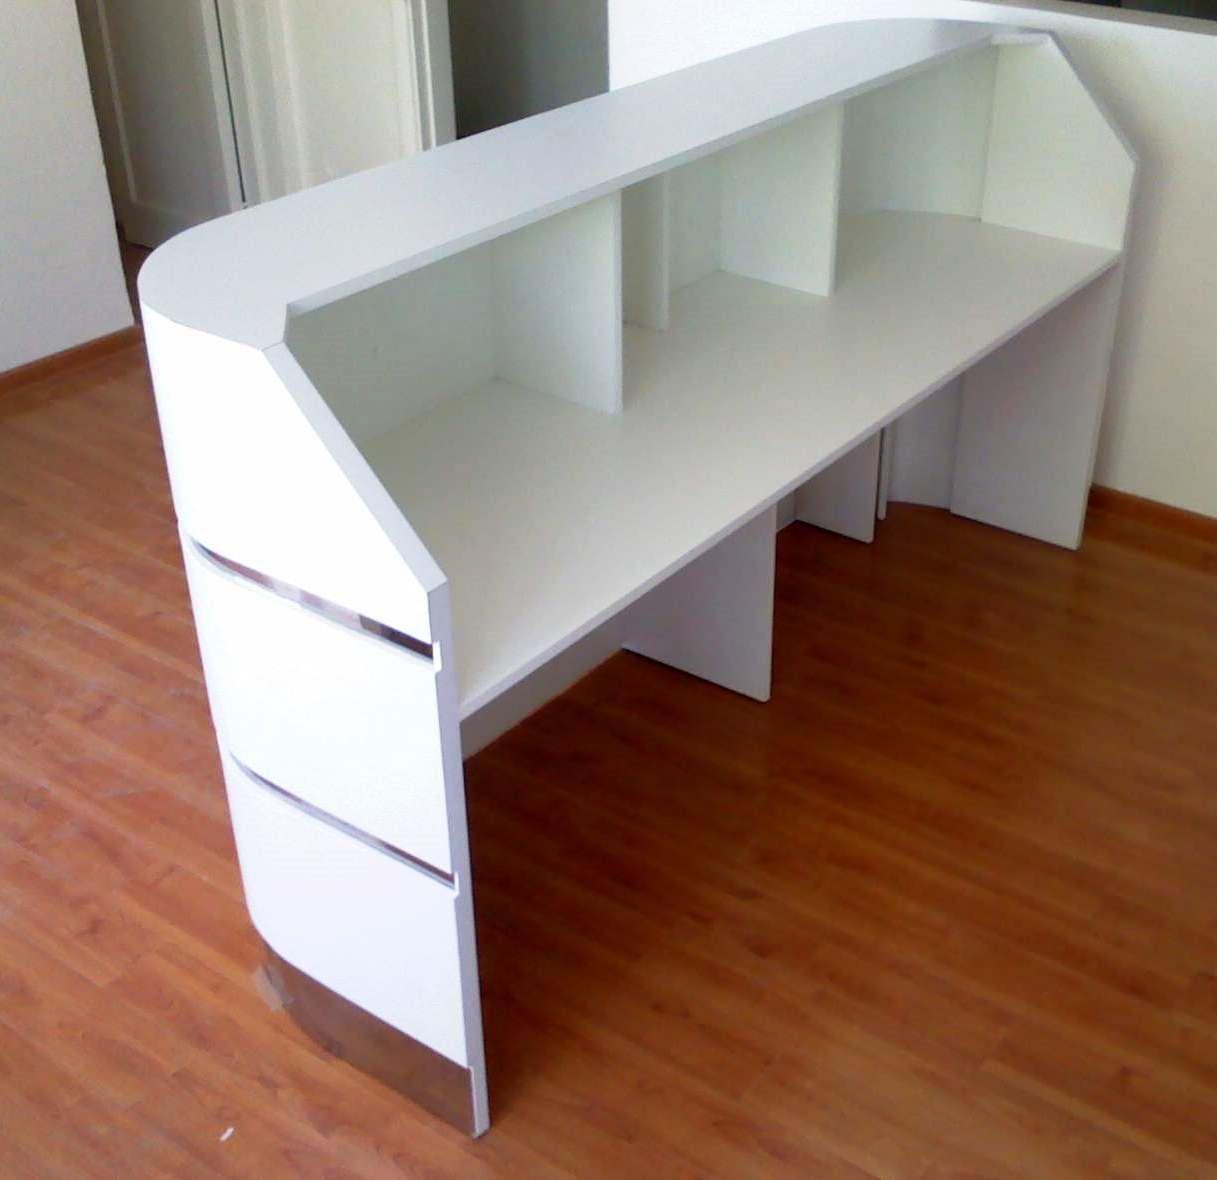 Muebles de recepci n muebles de recepci n moderna mueble for Recepcion oficina moderna